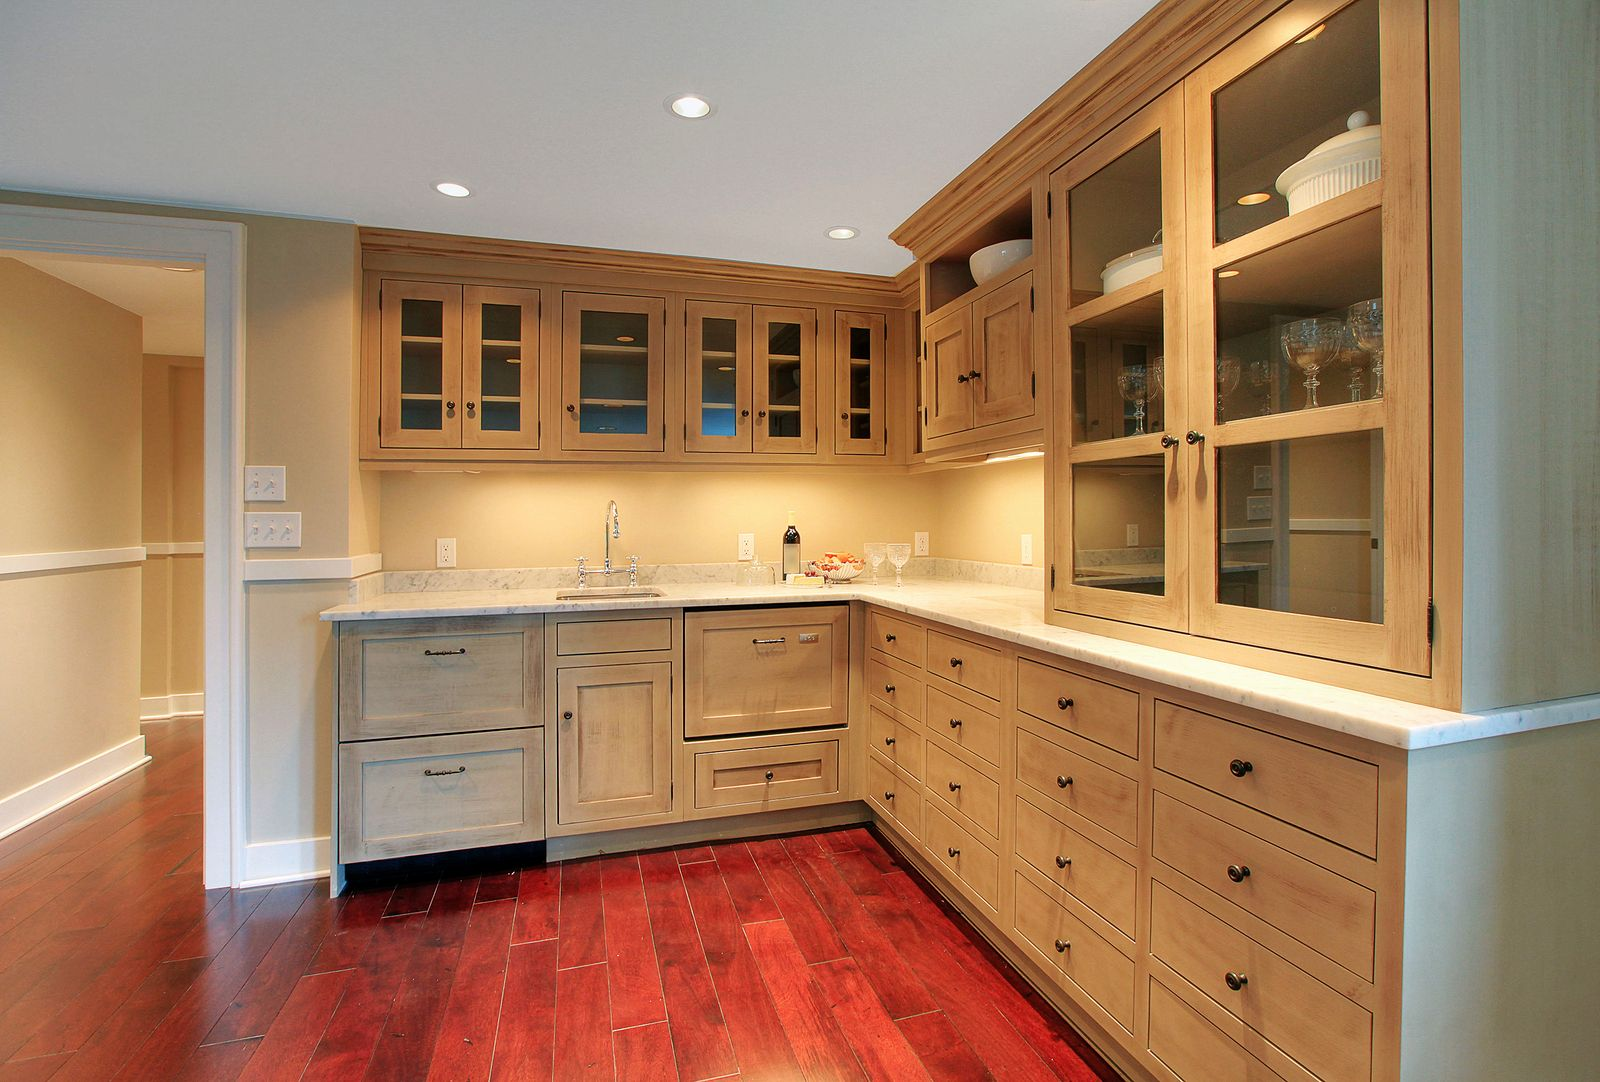 Why Remodel Pick Your Reason Tlc Incorporated Blog Small Basement Kitchen Basement Bar Designs Basement Bar